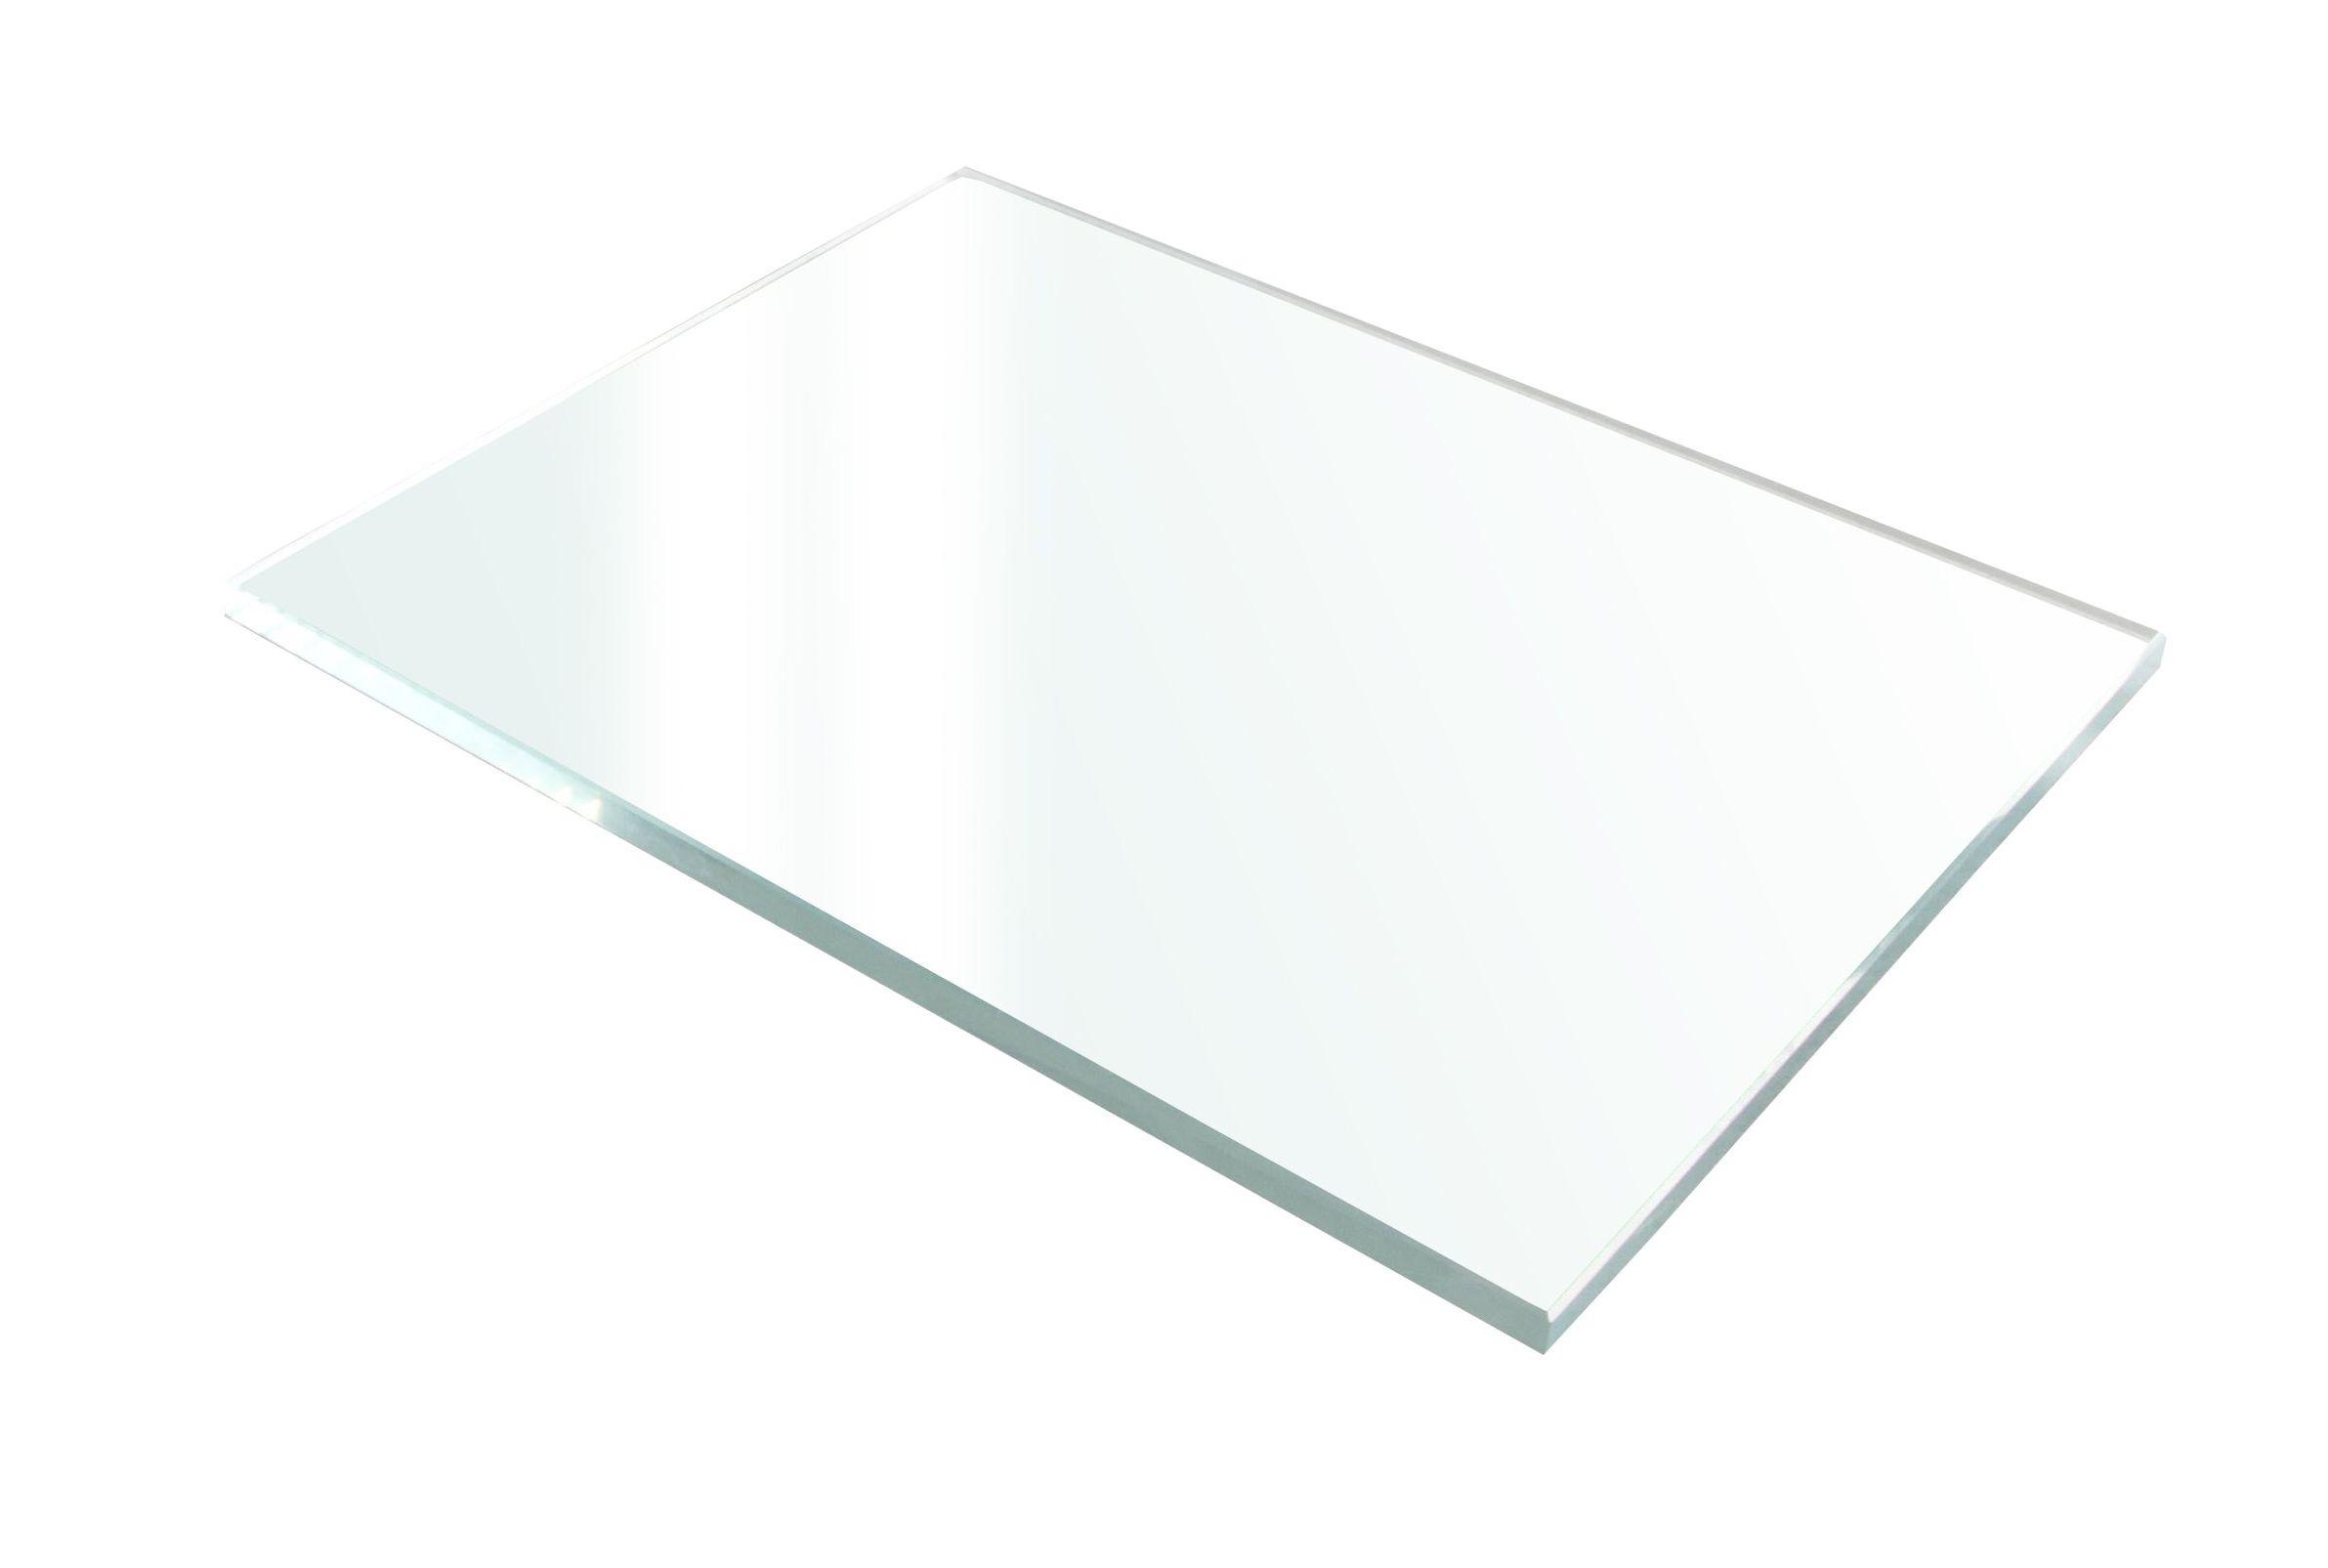 Tvrzené bílé sklo GN 1/3 - Verlo